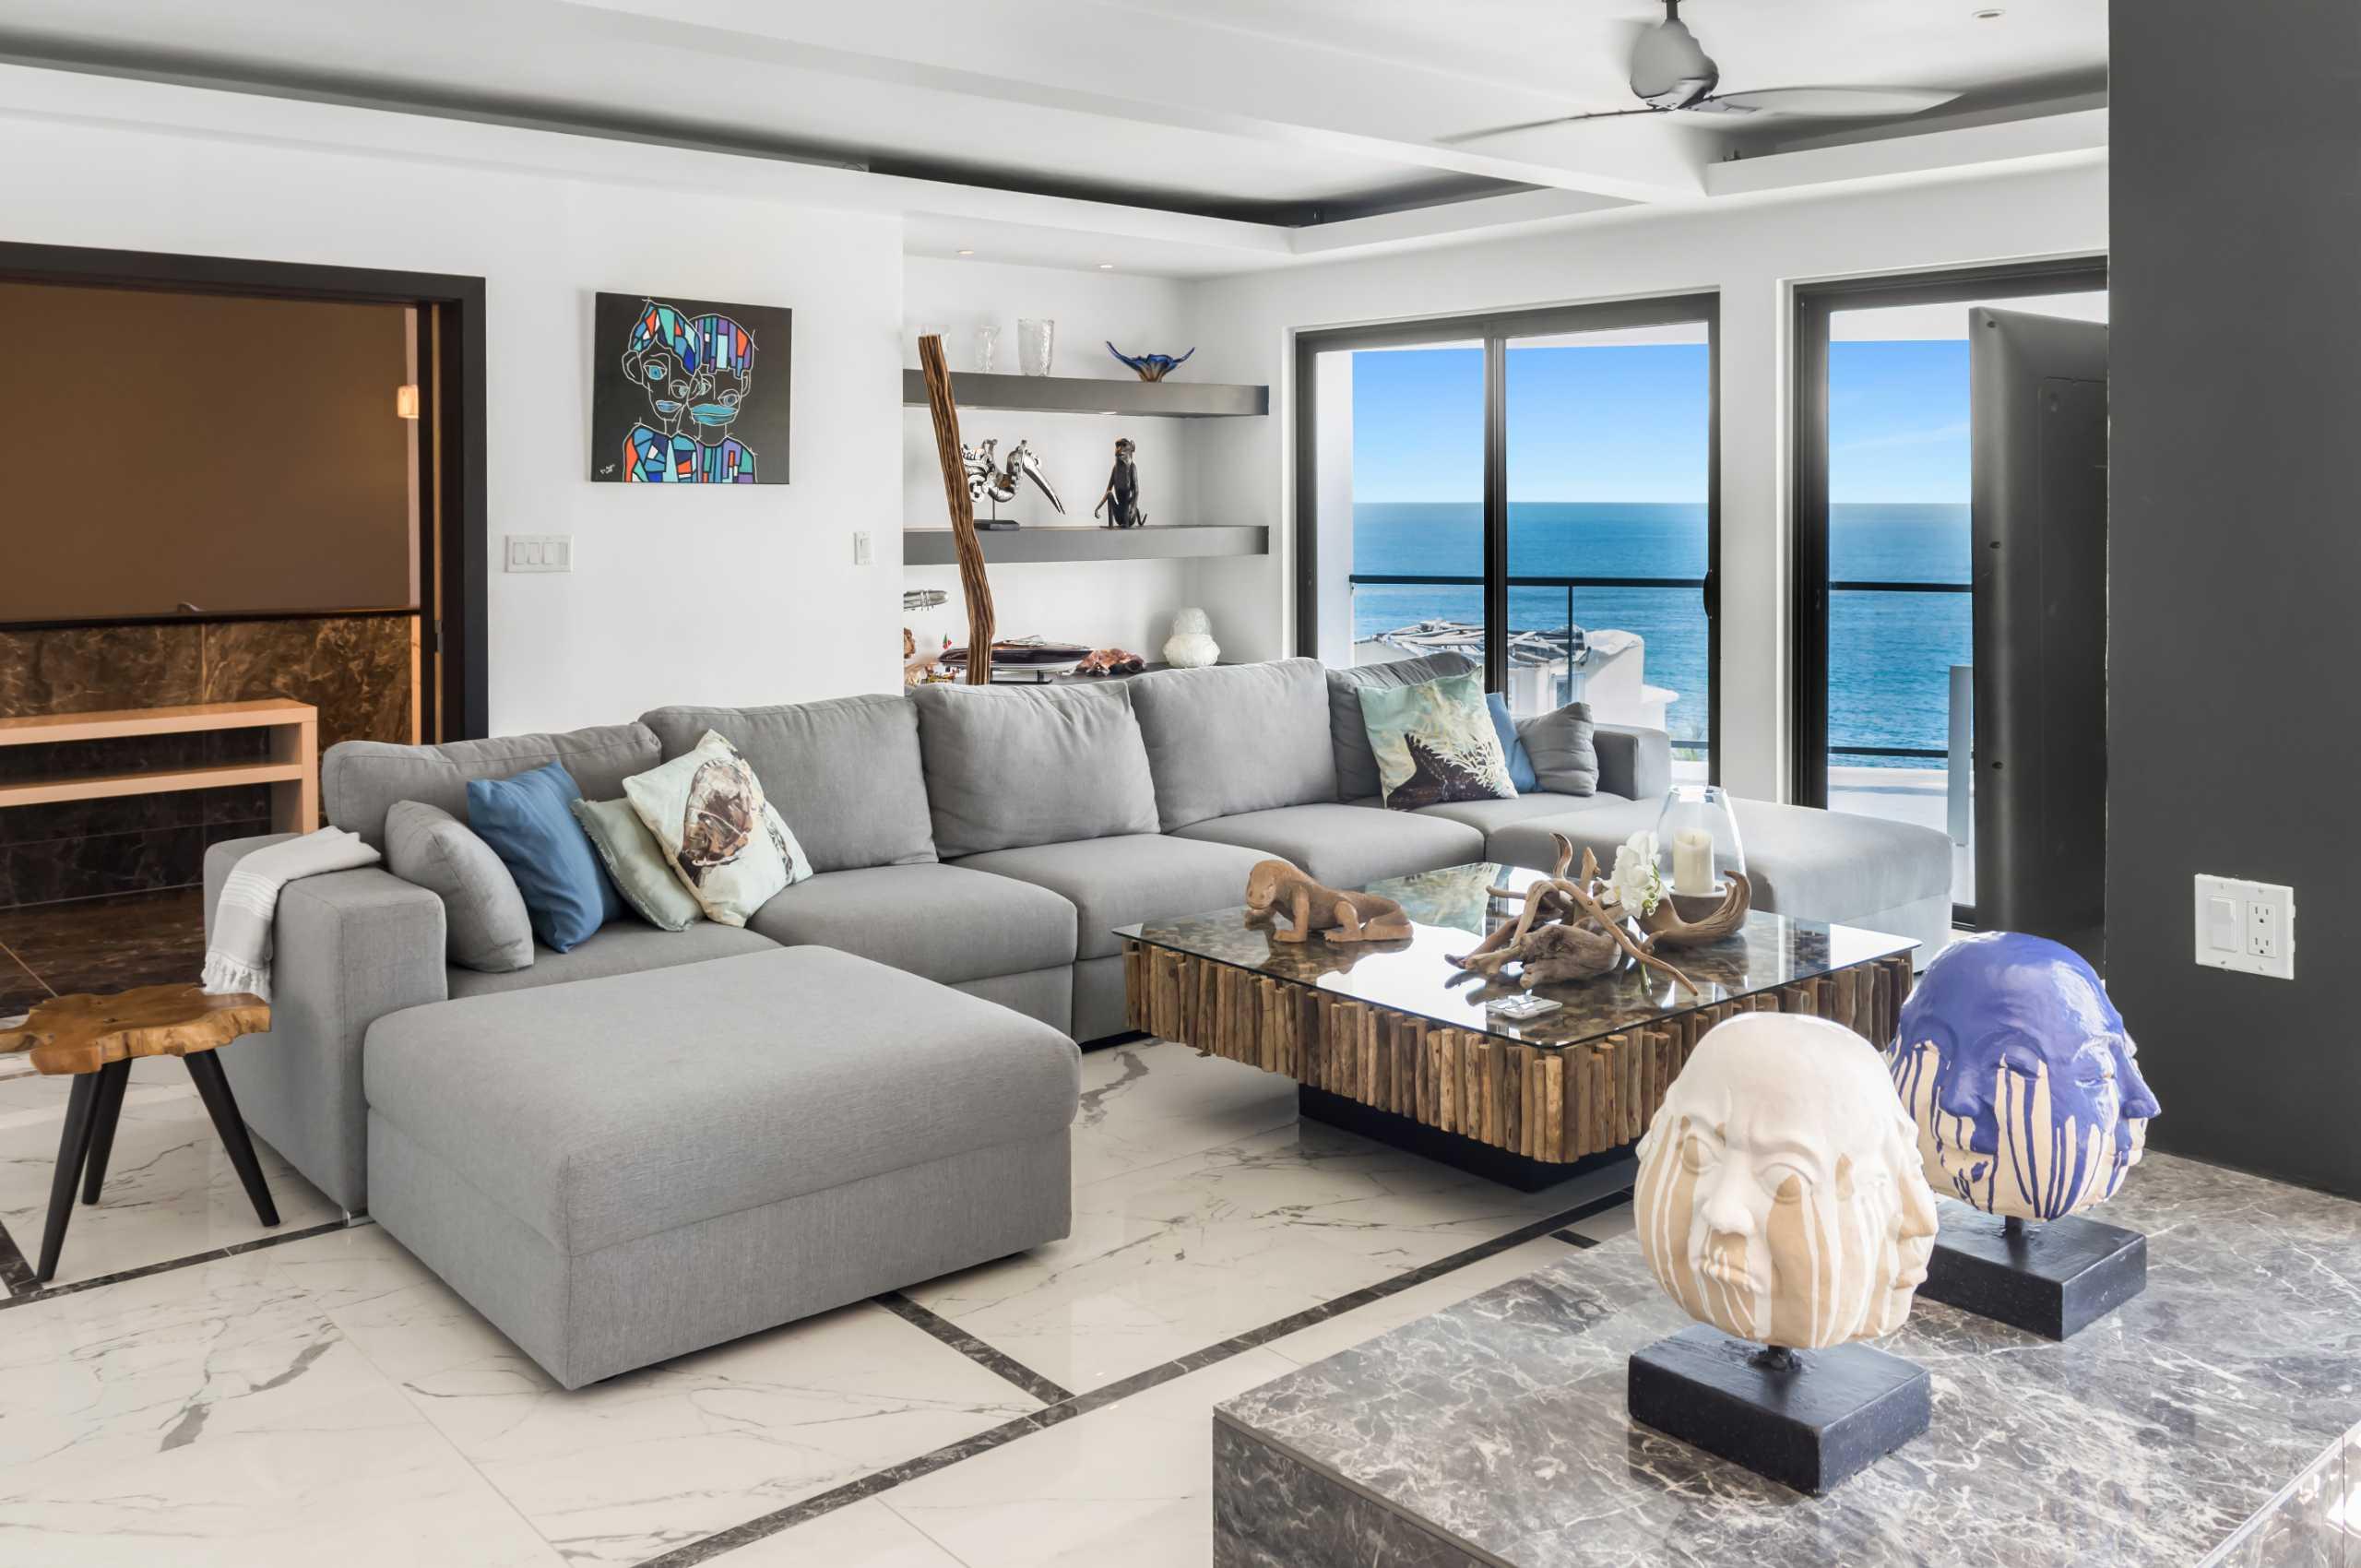 New Construction St Maarten Penthouse At Vanina Beach Residences